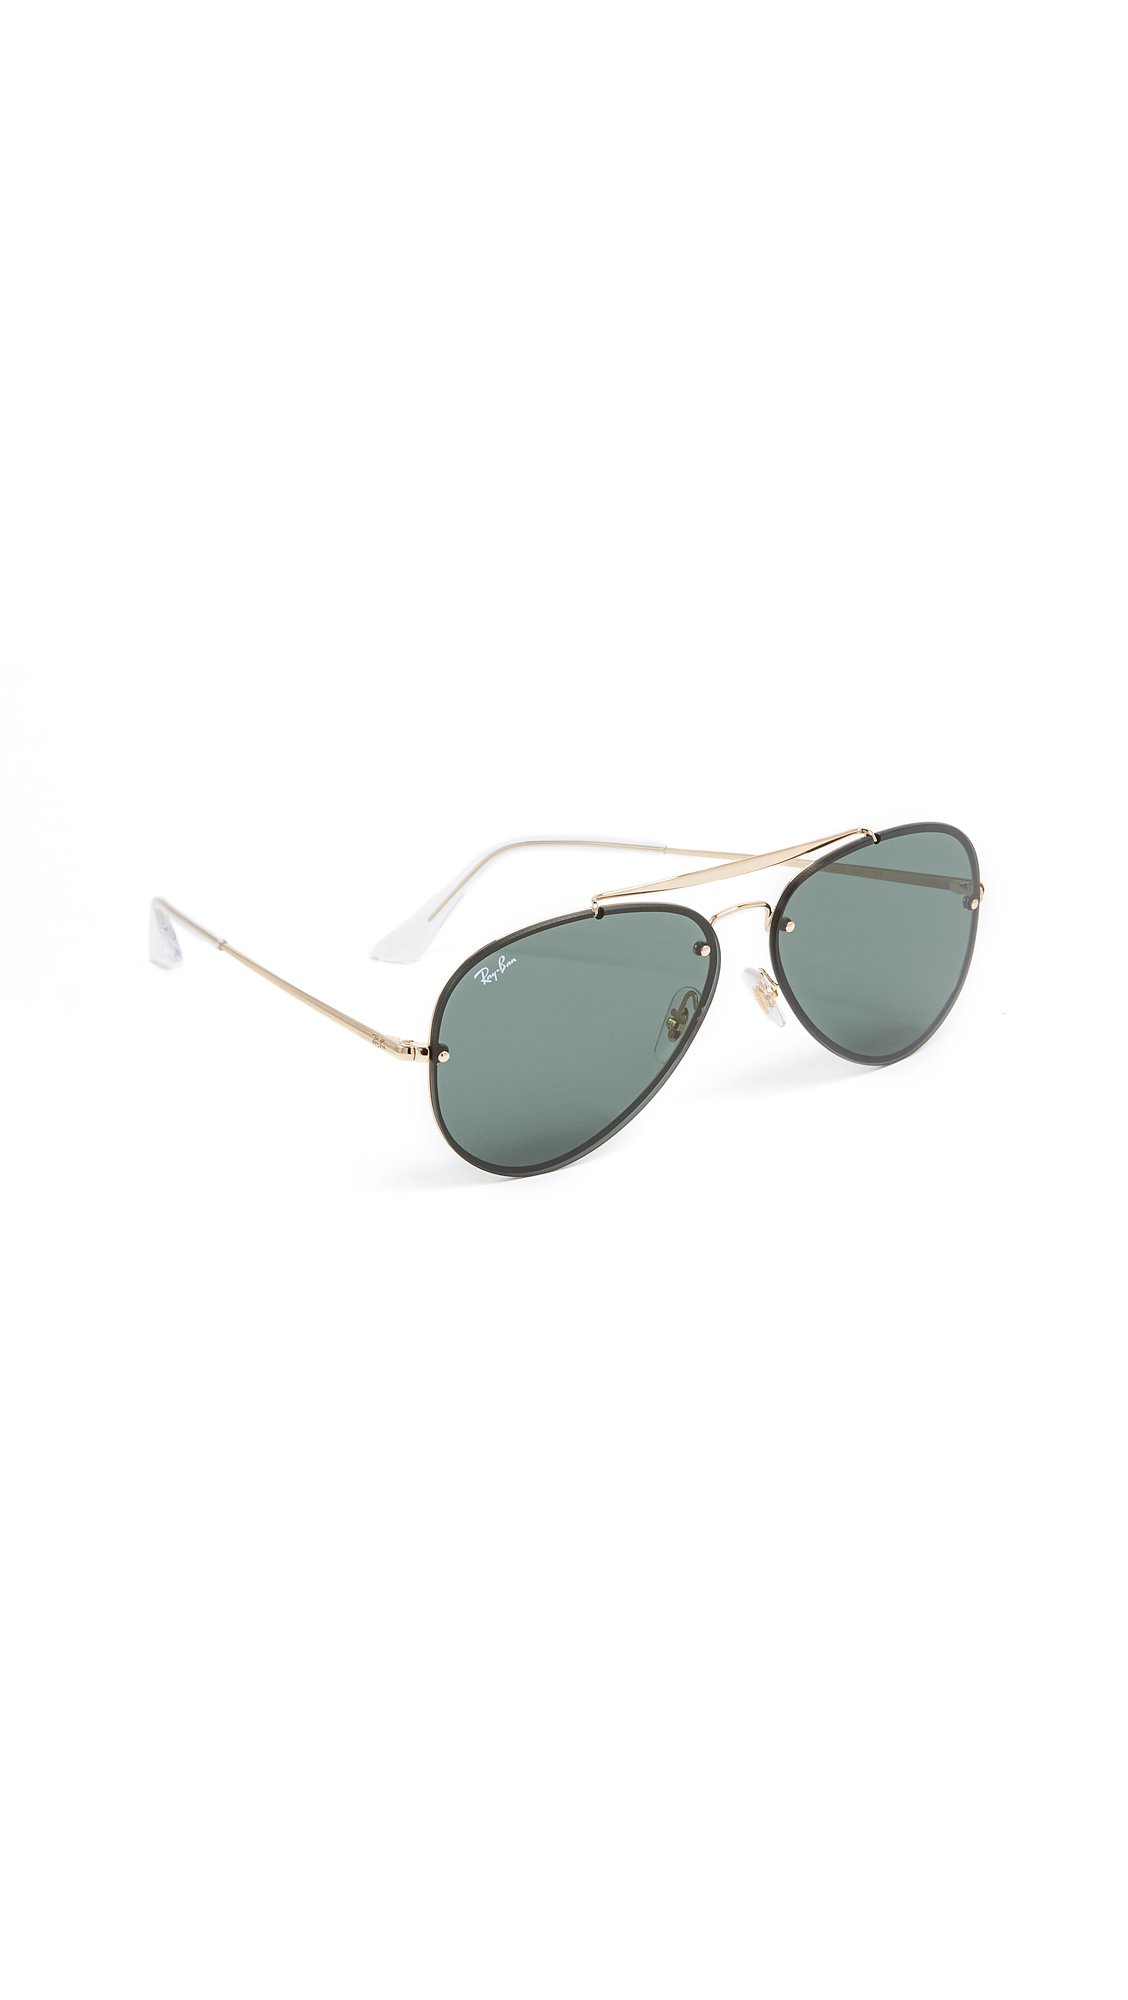 Ray-Ban Blaze Aviator Sunglasses, Gold, 61 mm by Ray-Ban